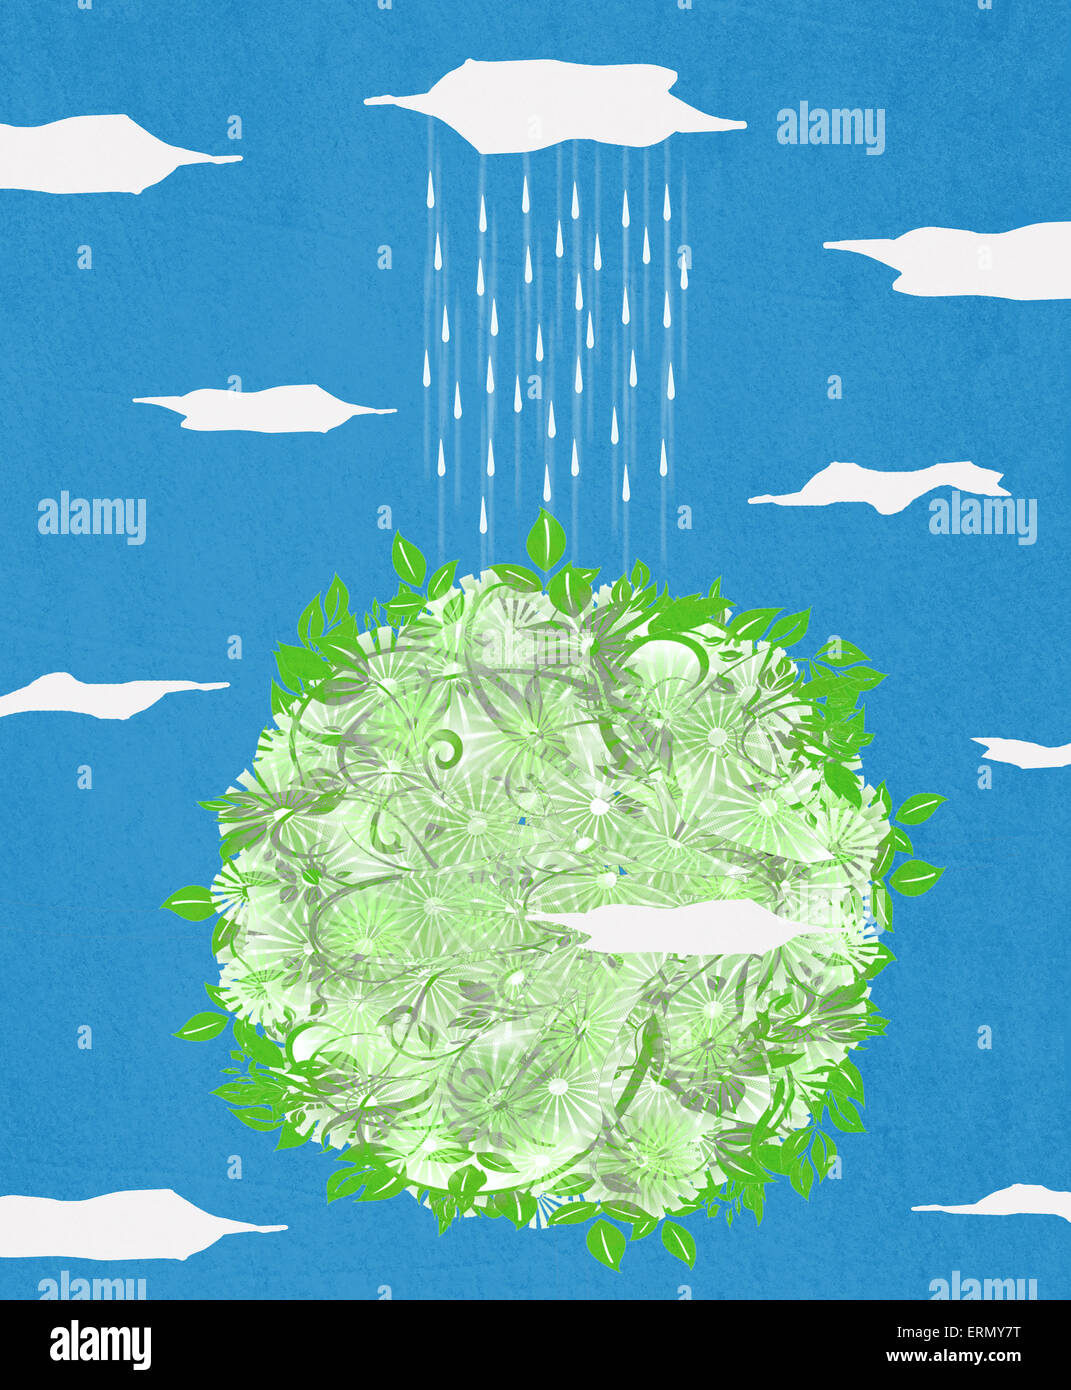 green planet  and rain digital illustration - Stock Image